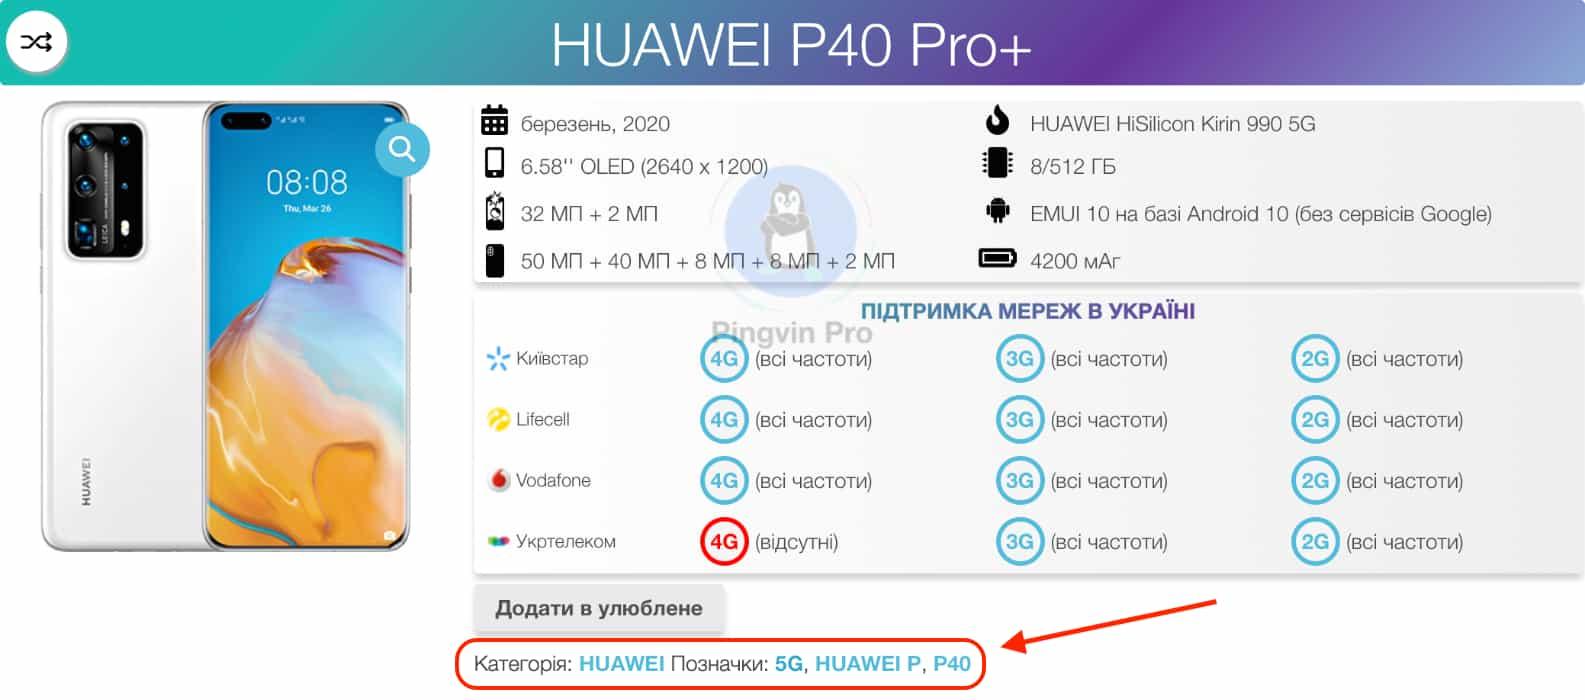 Pingvin Pro - база смартфонів - позначки